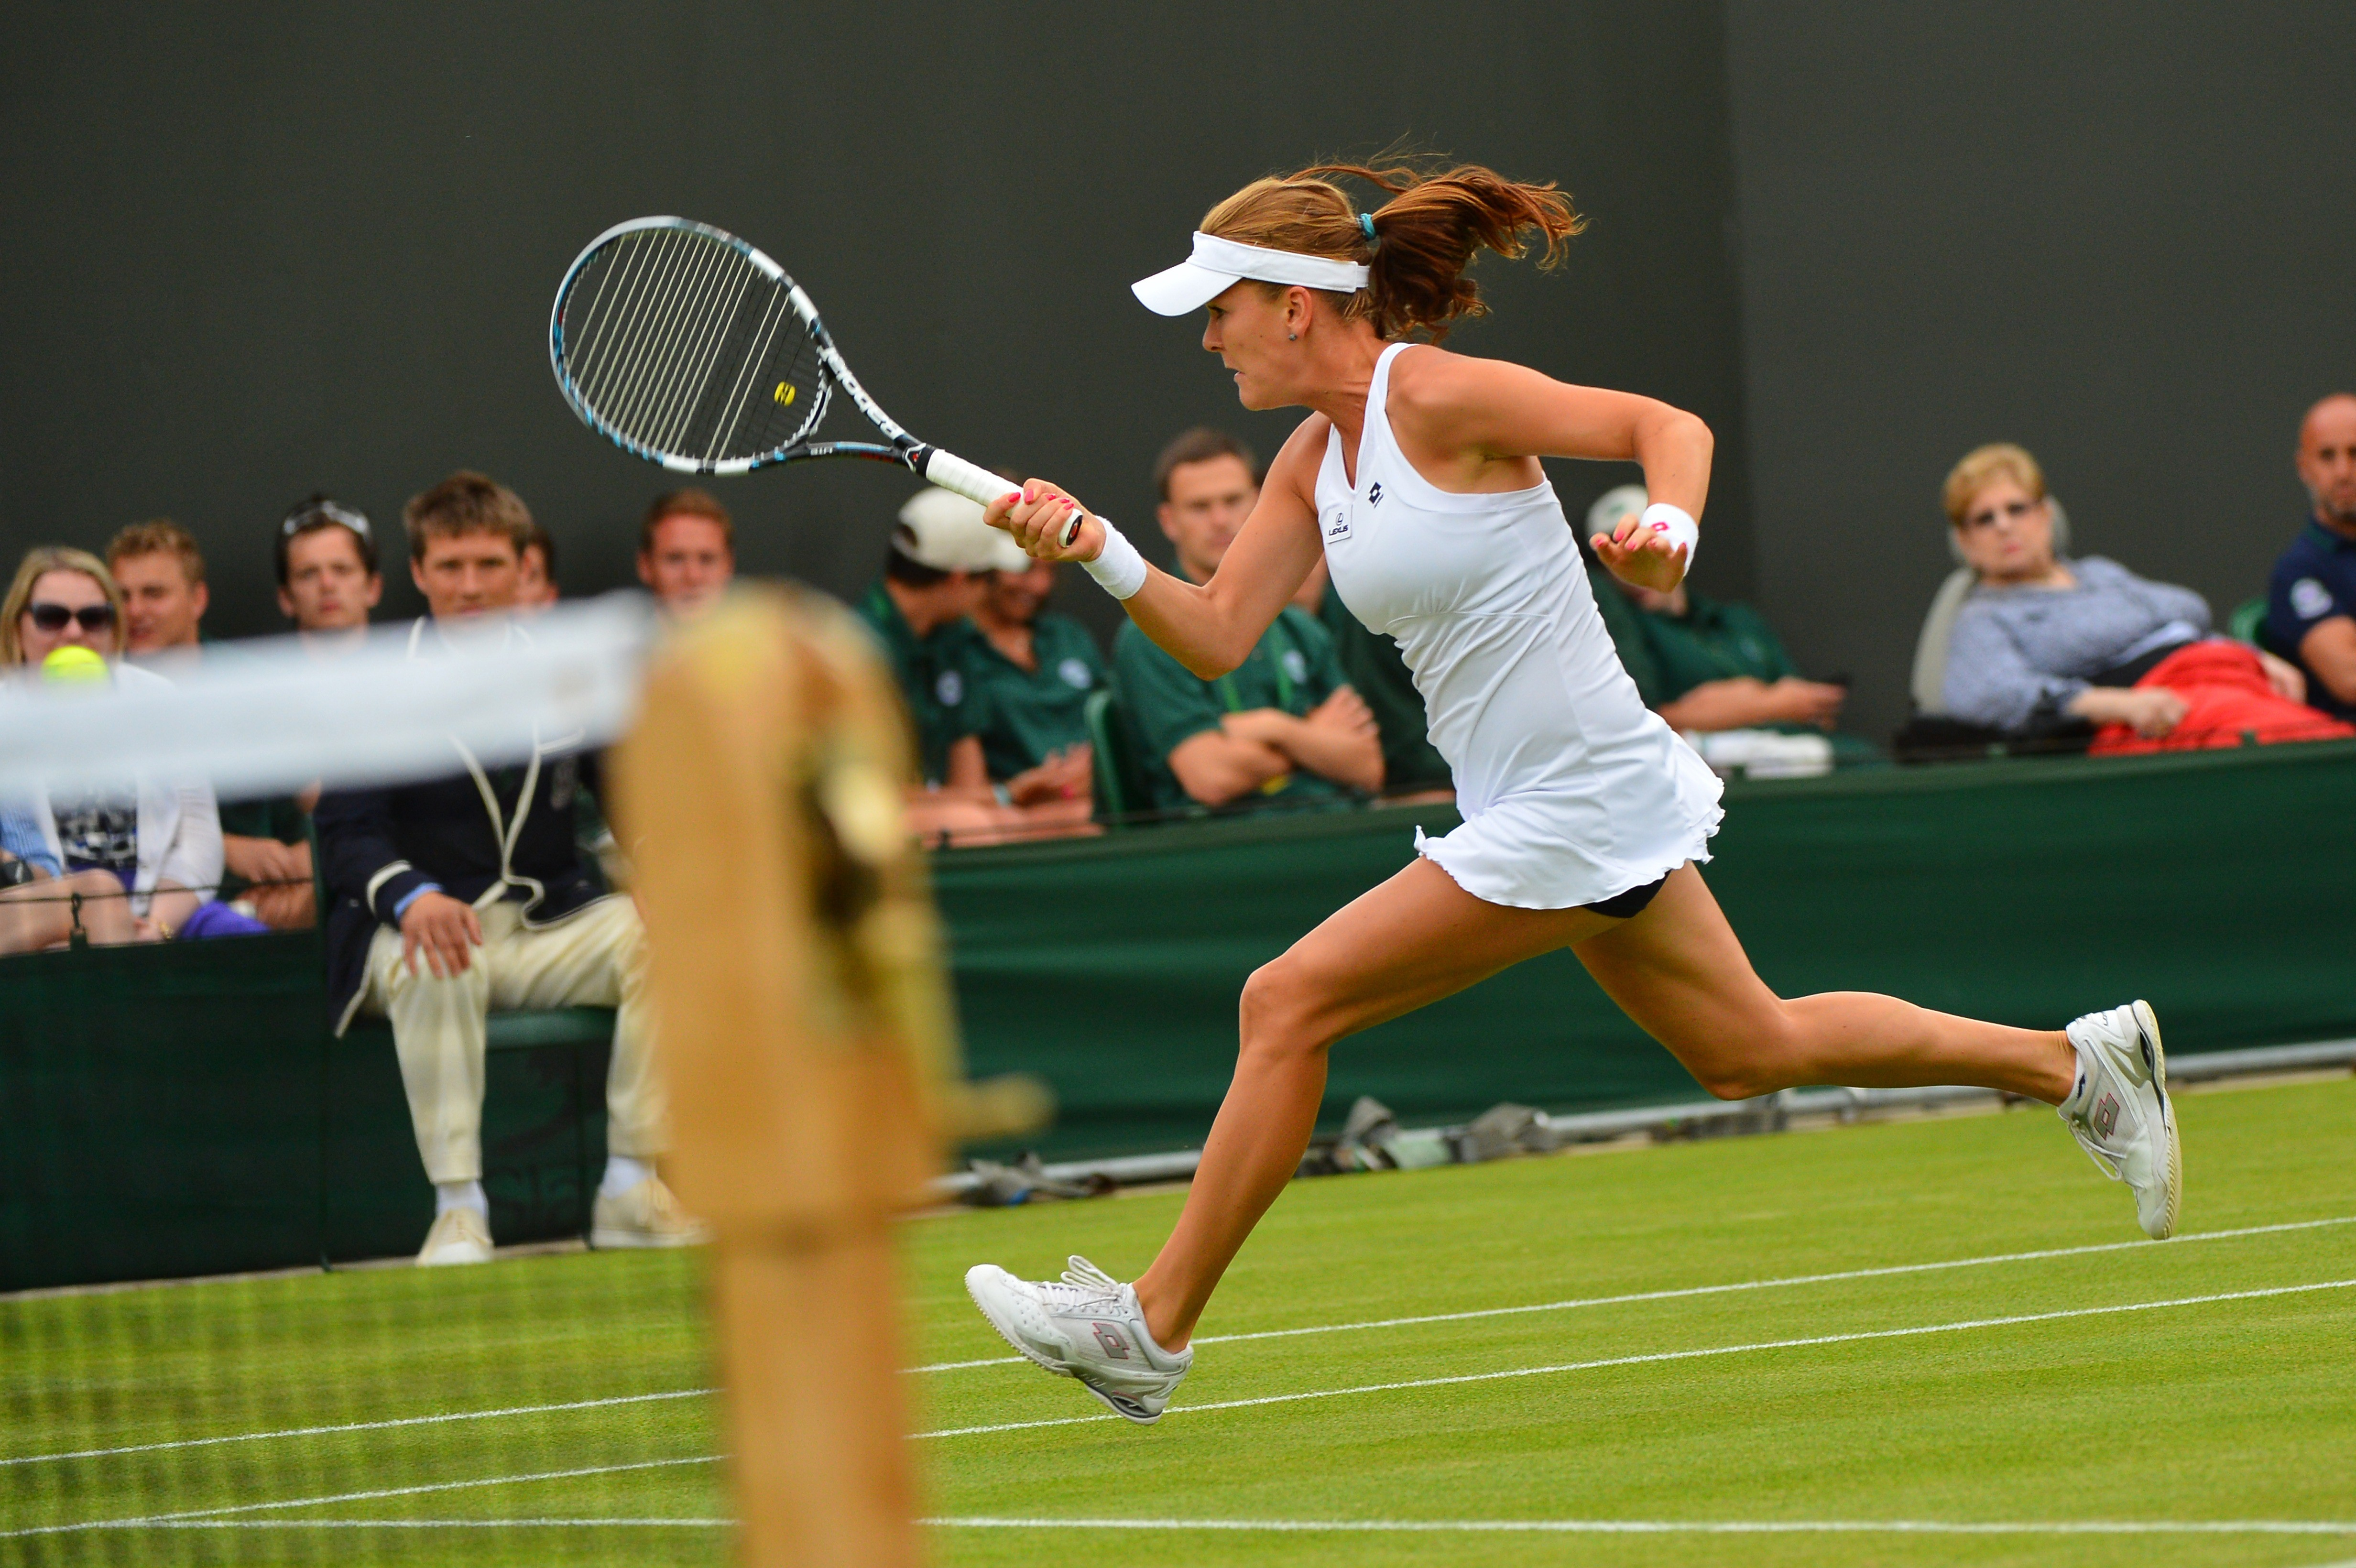 Agnieszka Radwanska Wimbledon 2012